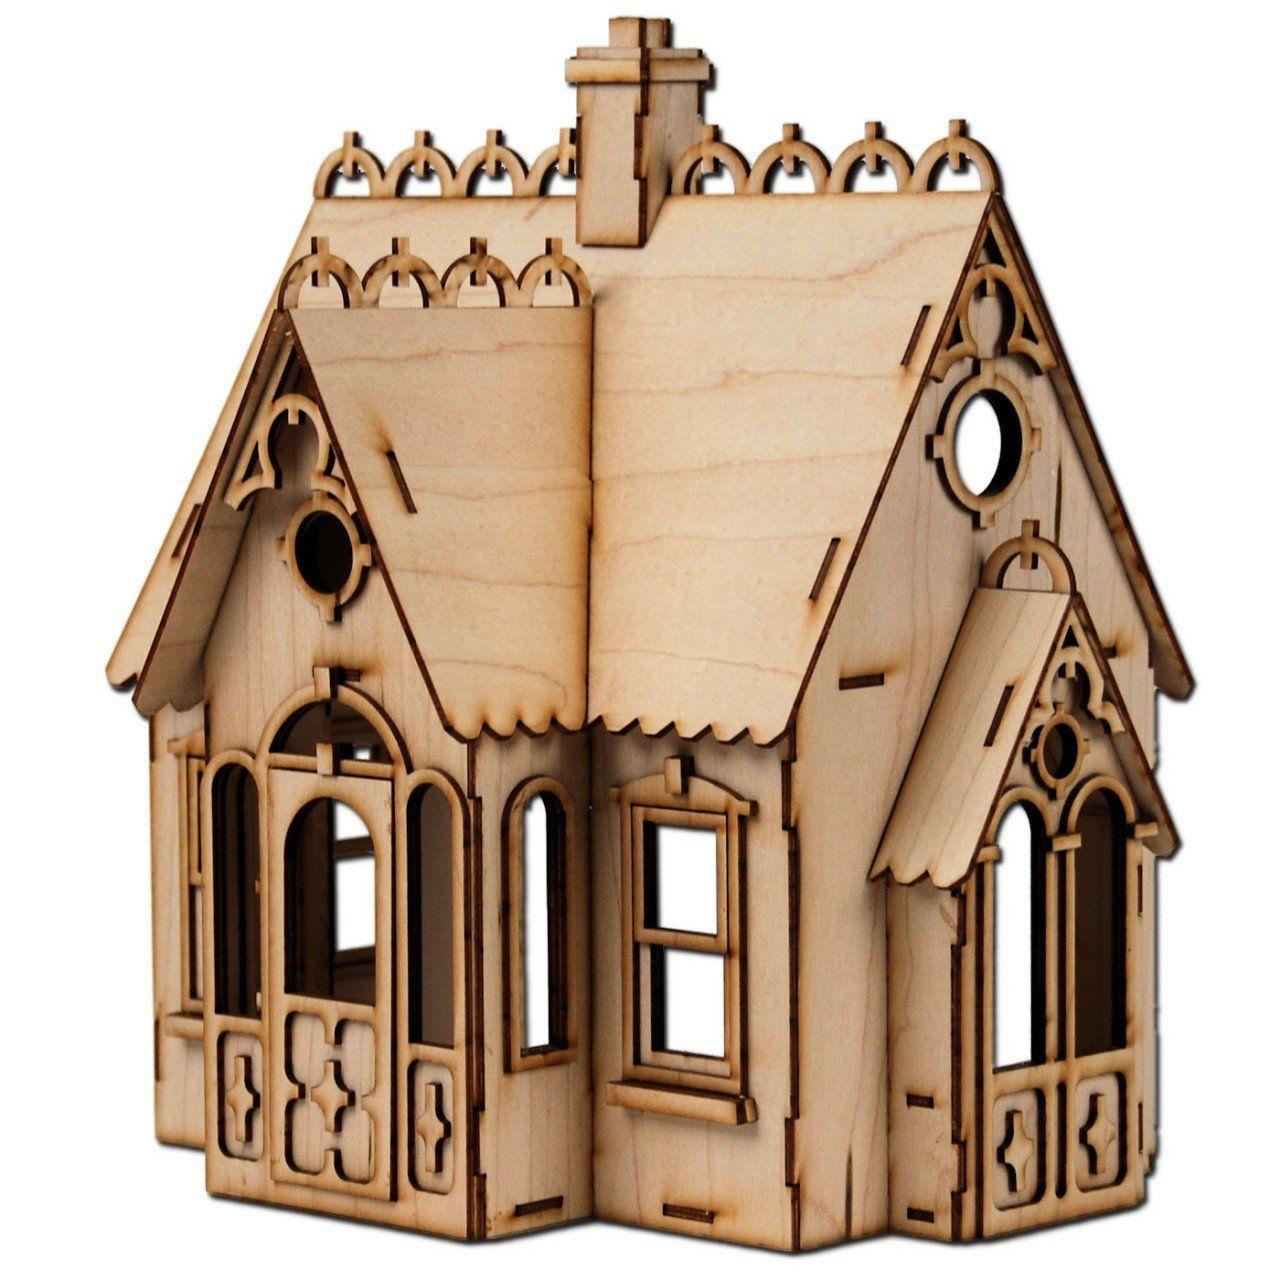 Amazon.com: Half Scale Buttercup Laser Cut Dollhouse Kit 1